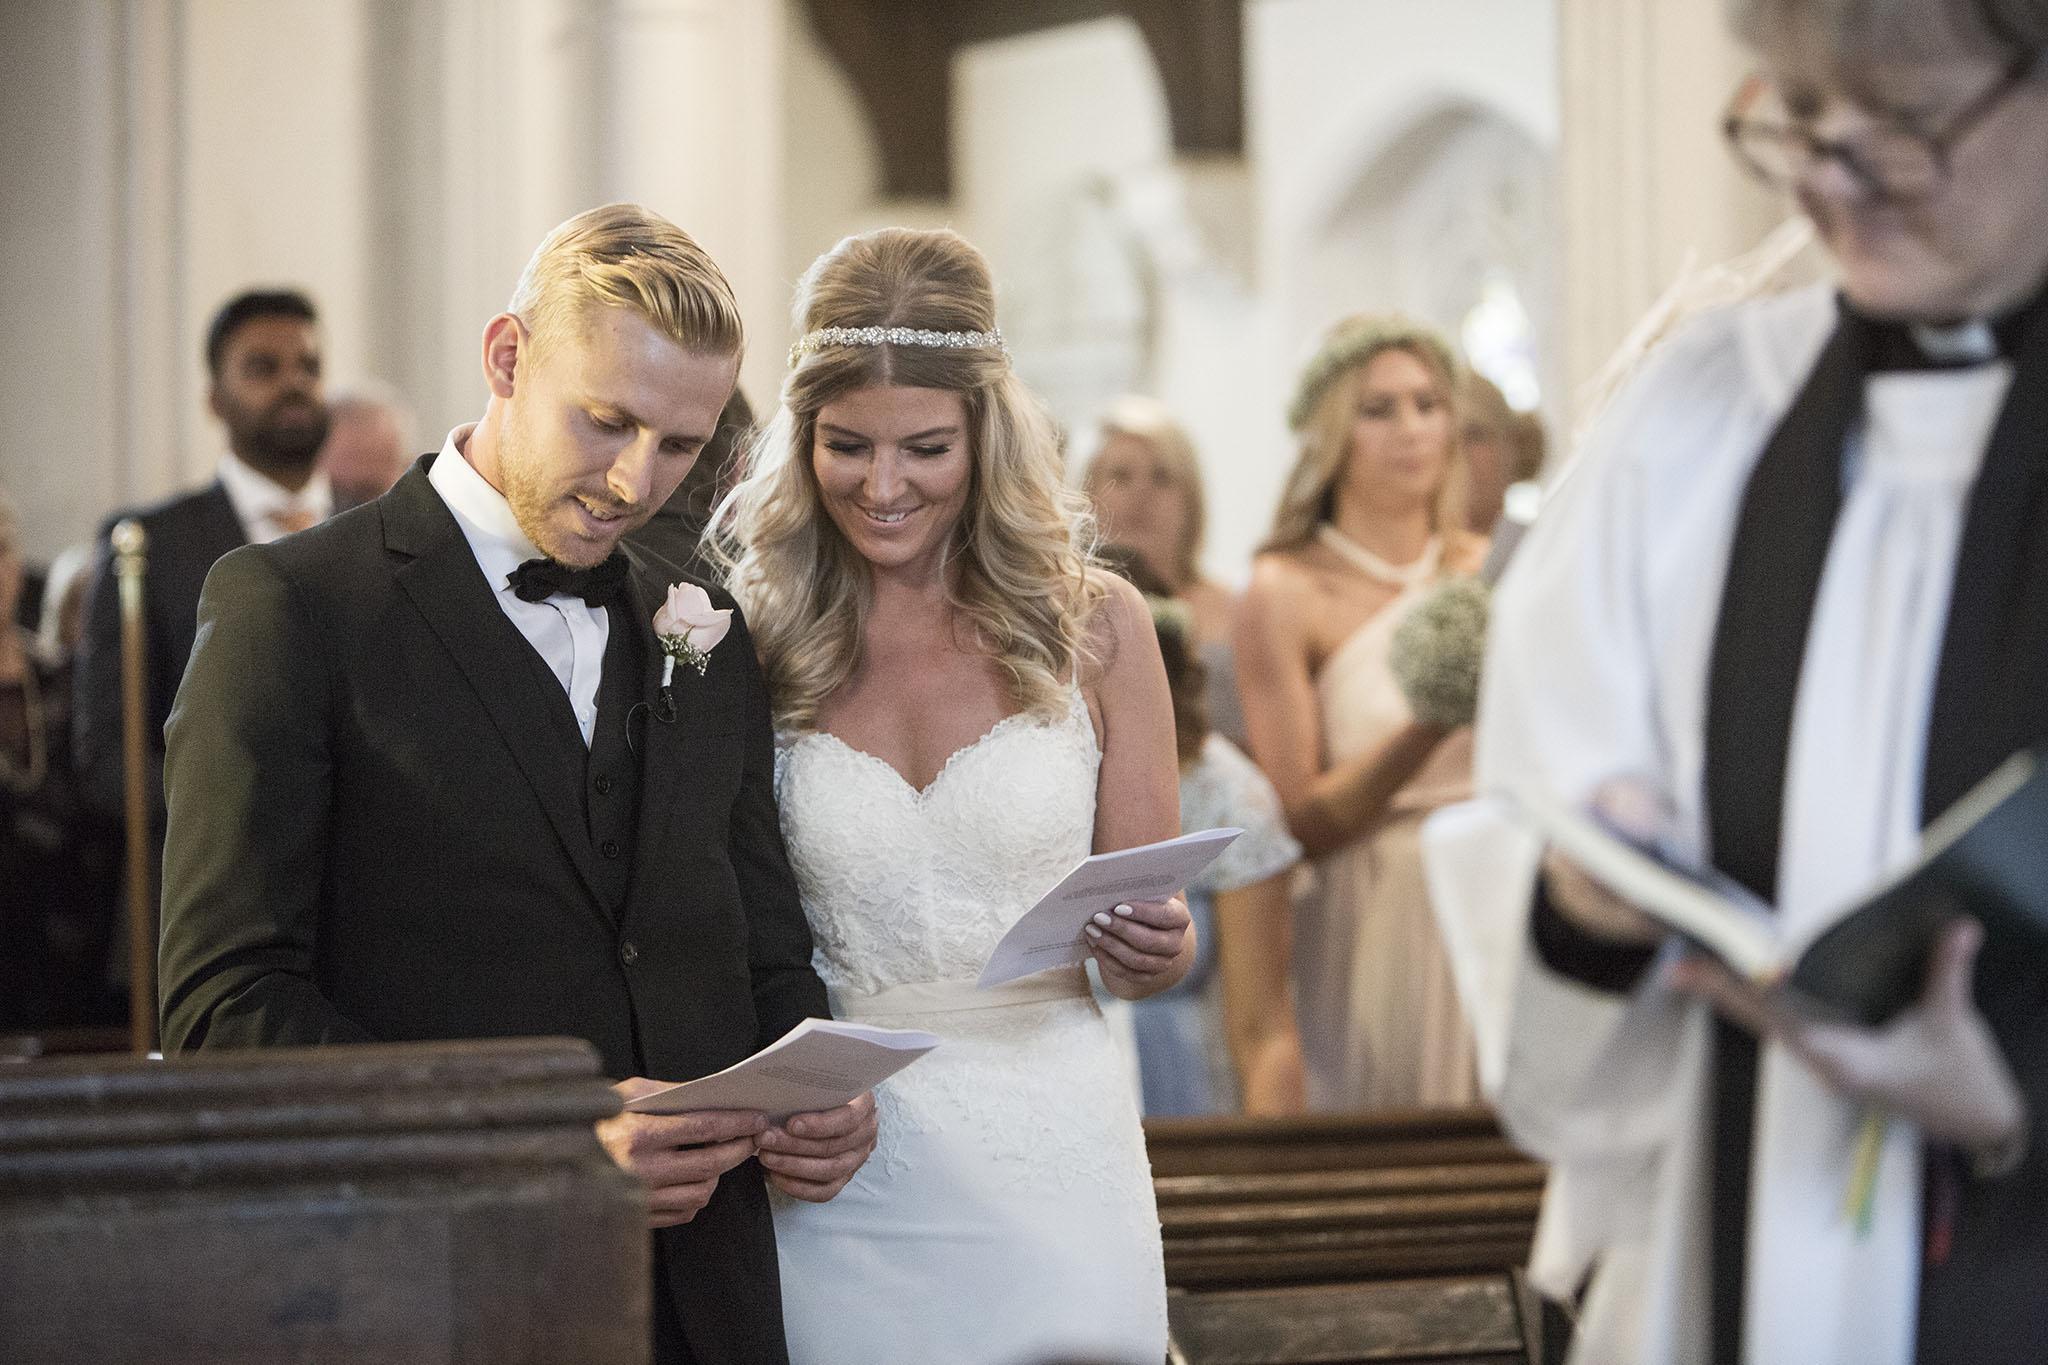 elizabethgphotography_kingslangley_hertfordshire_fineart_wedding_stmichaelsmanor_hotel_stalbans_luciejack_18.jpg